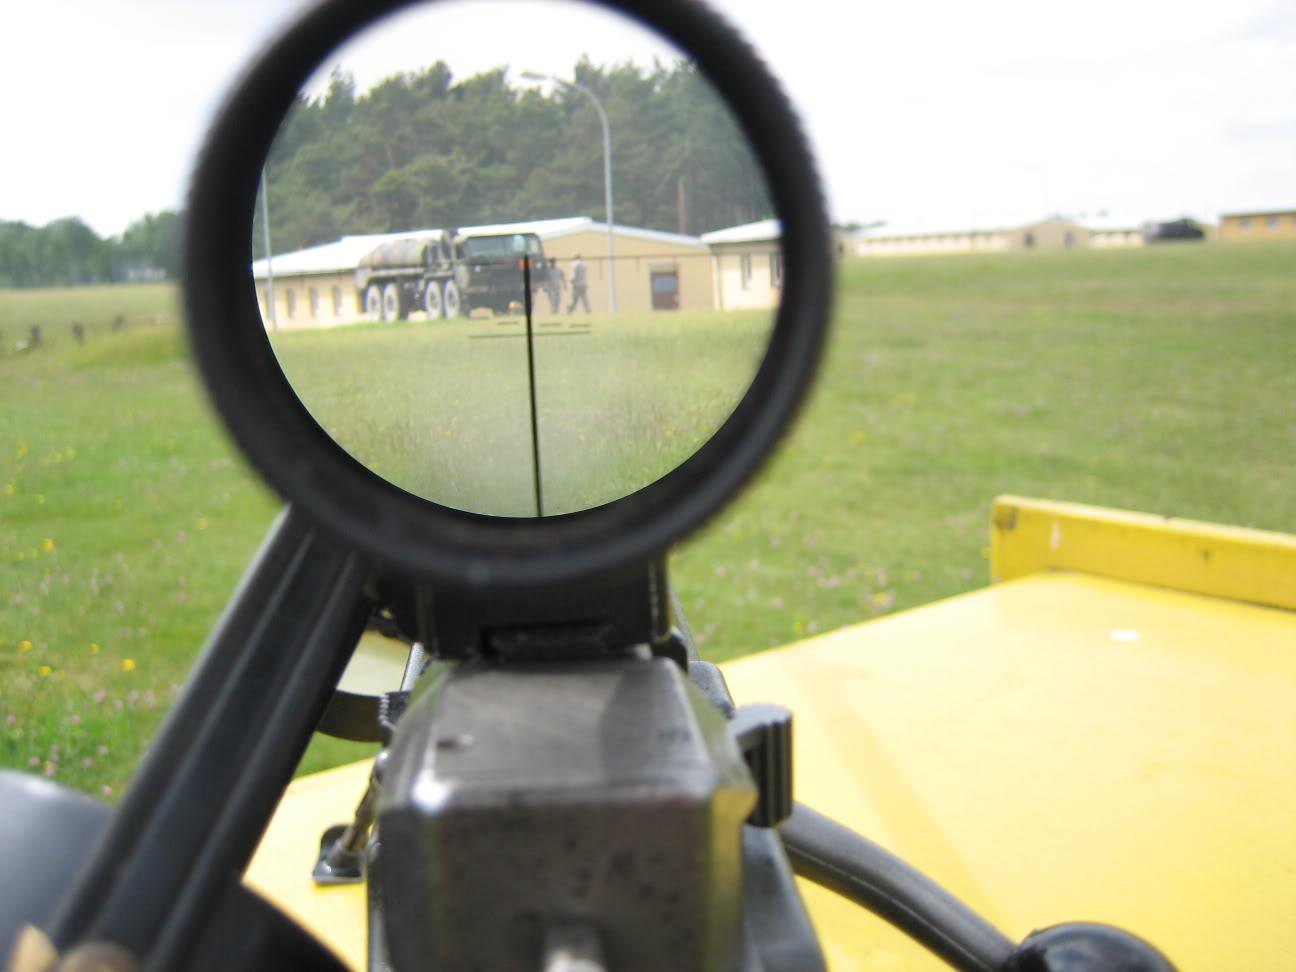 AW 7.62mm rifle,  Belgian Army sniperrifle GTA2008_0488